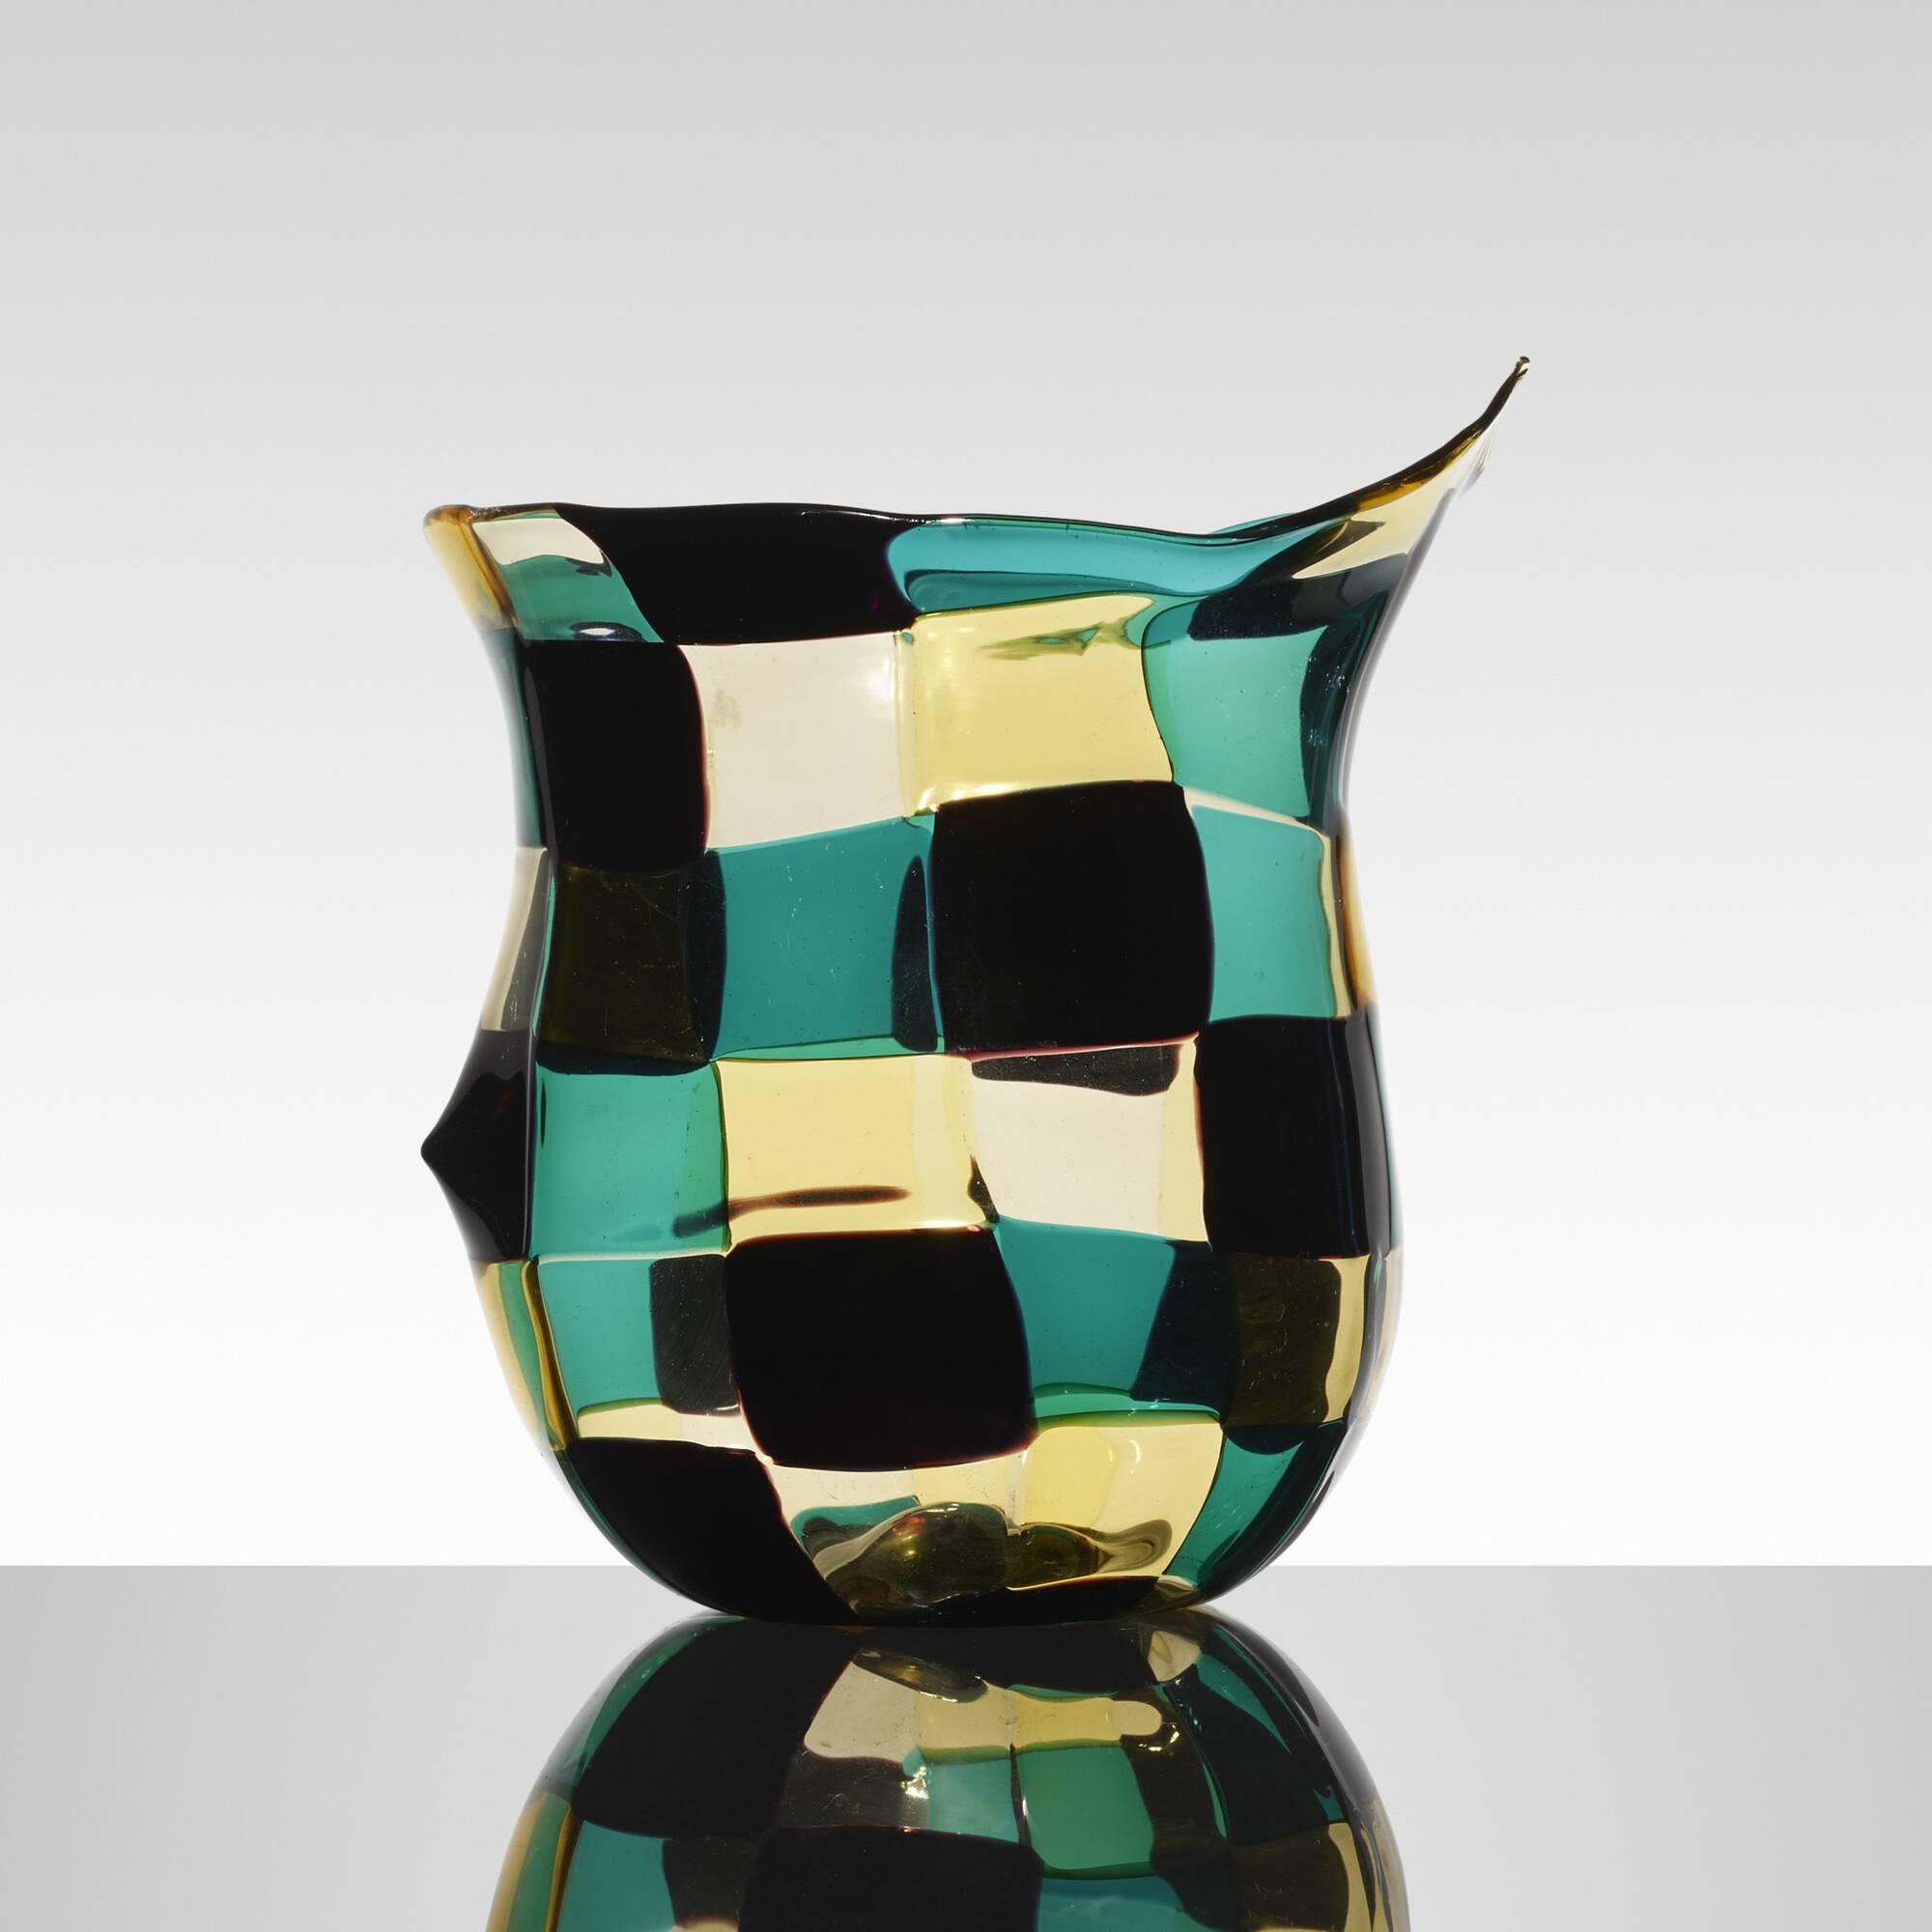 138: Fulvio Bianconi / Pezzato vase (2 of 3)